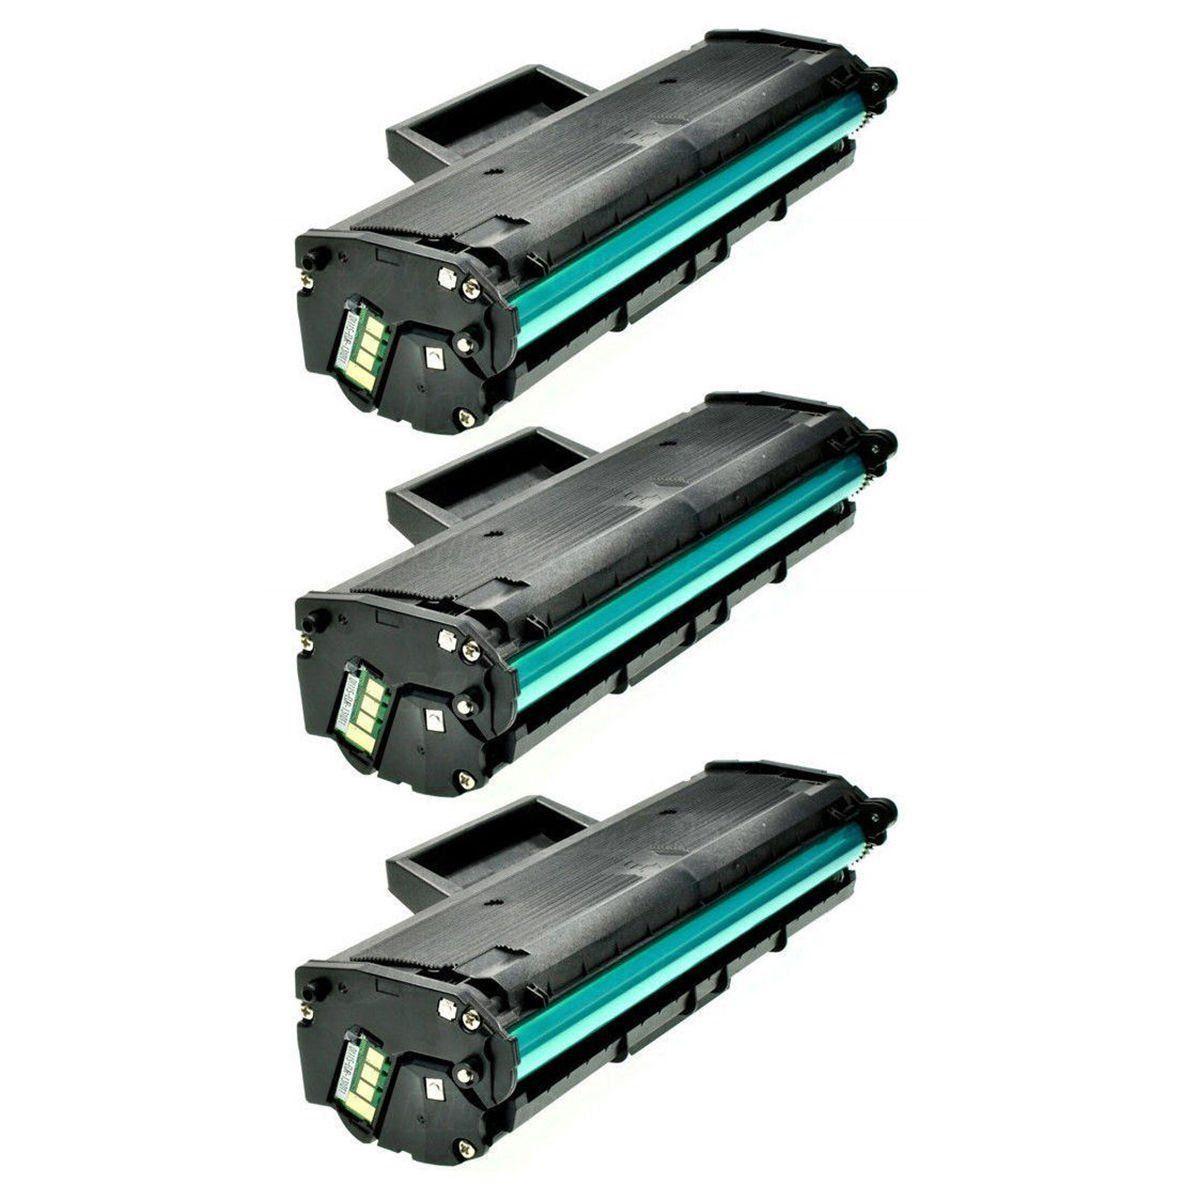 Compatível: Kit 3x Toner MLT-D111S para Samsung M2070 M2070w M2070fw M2022 M2022w M2020 M2020w M2020fw / Preto / 1.000